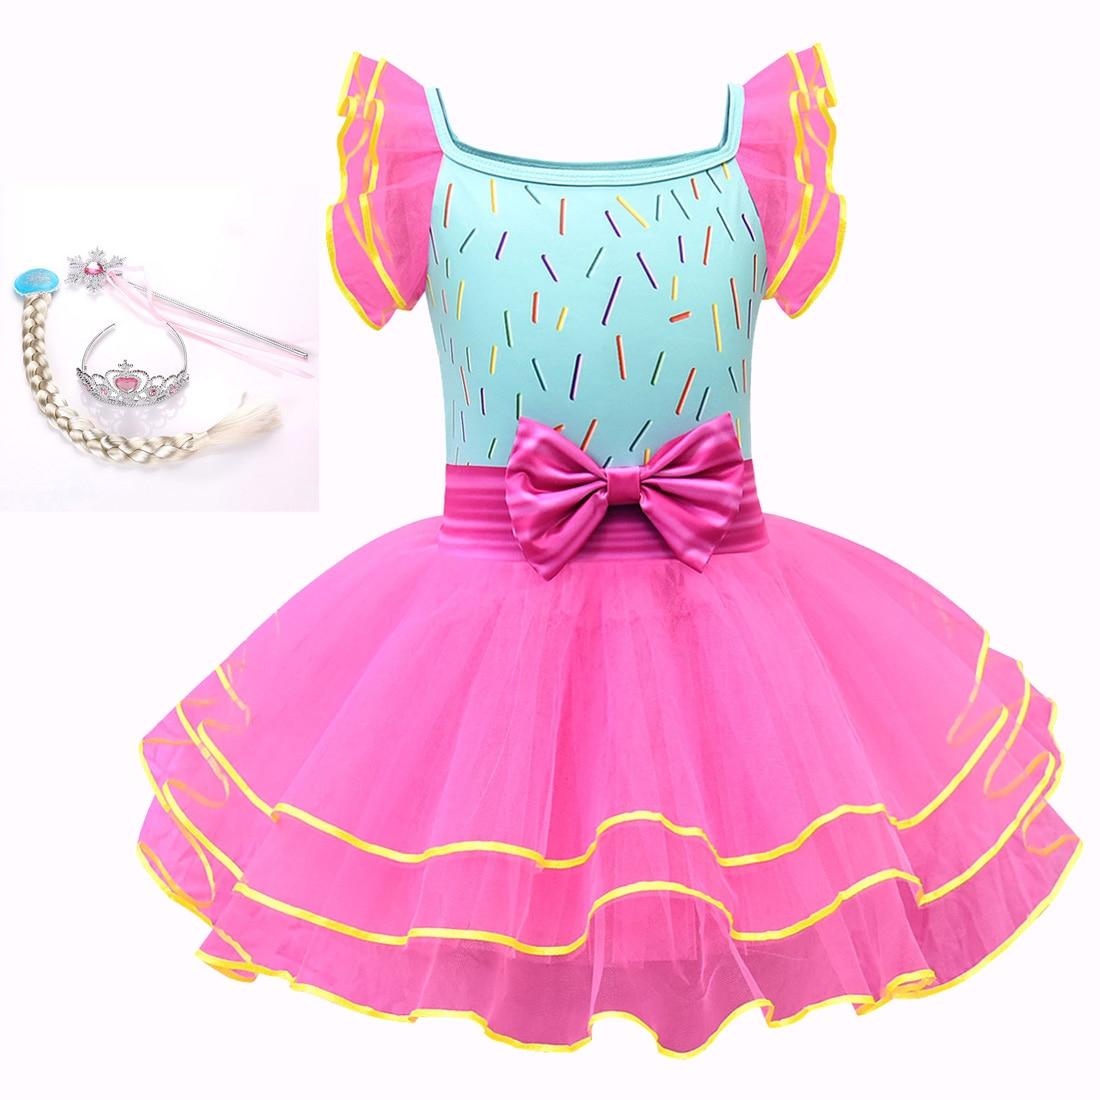 Girls dress fancy nancy beautiful Nancy cosplay children/'s dress sling tutu